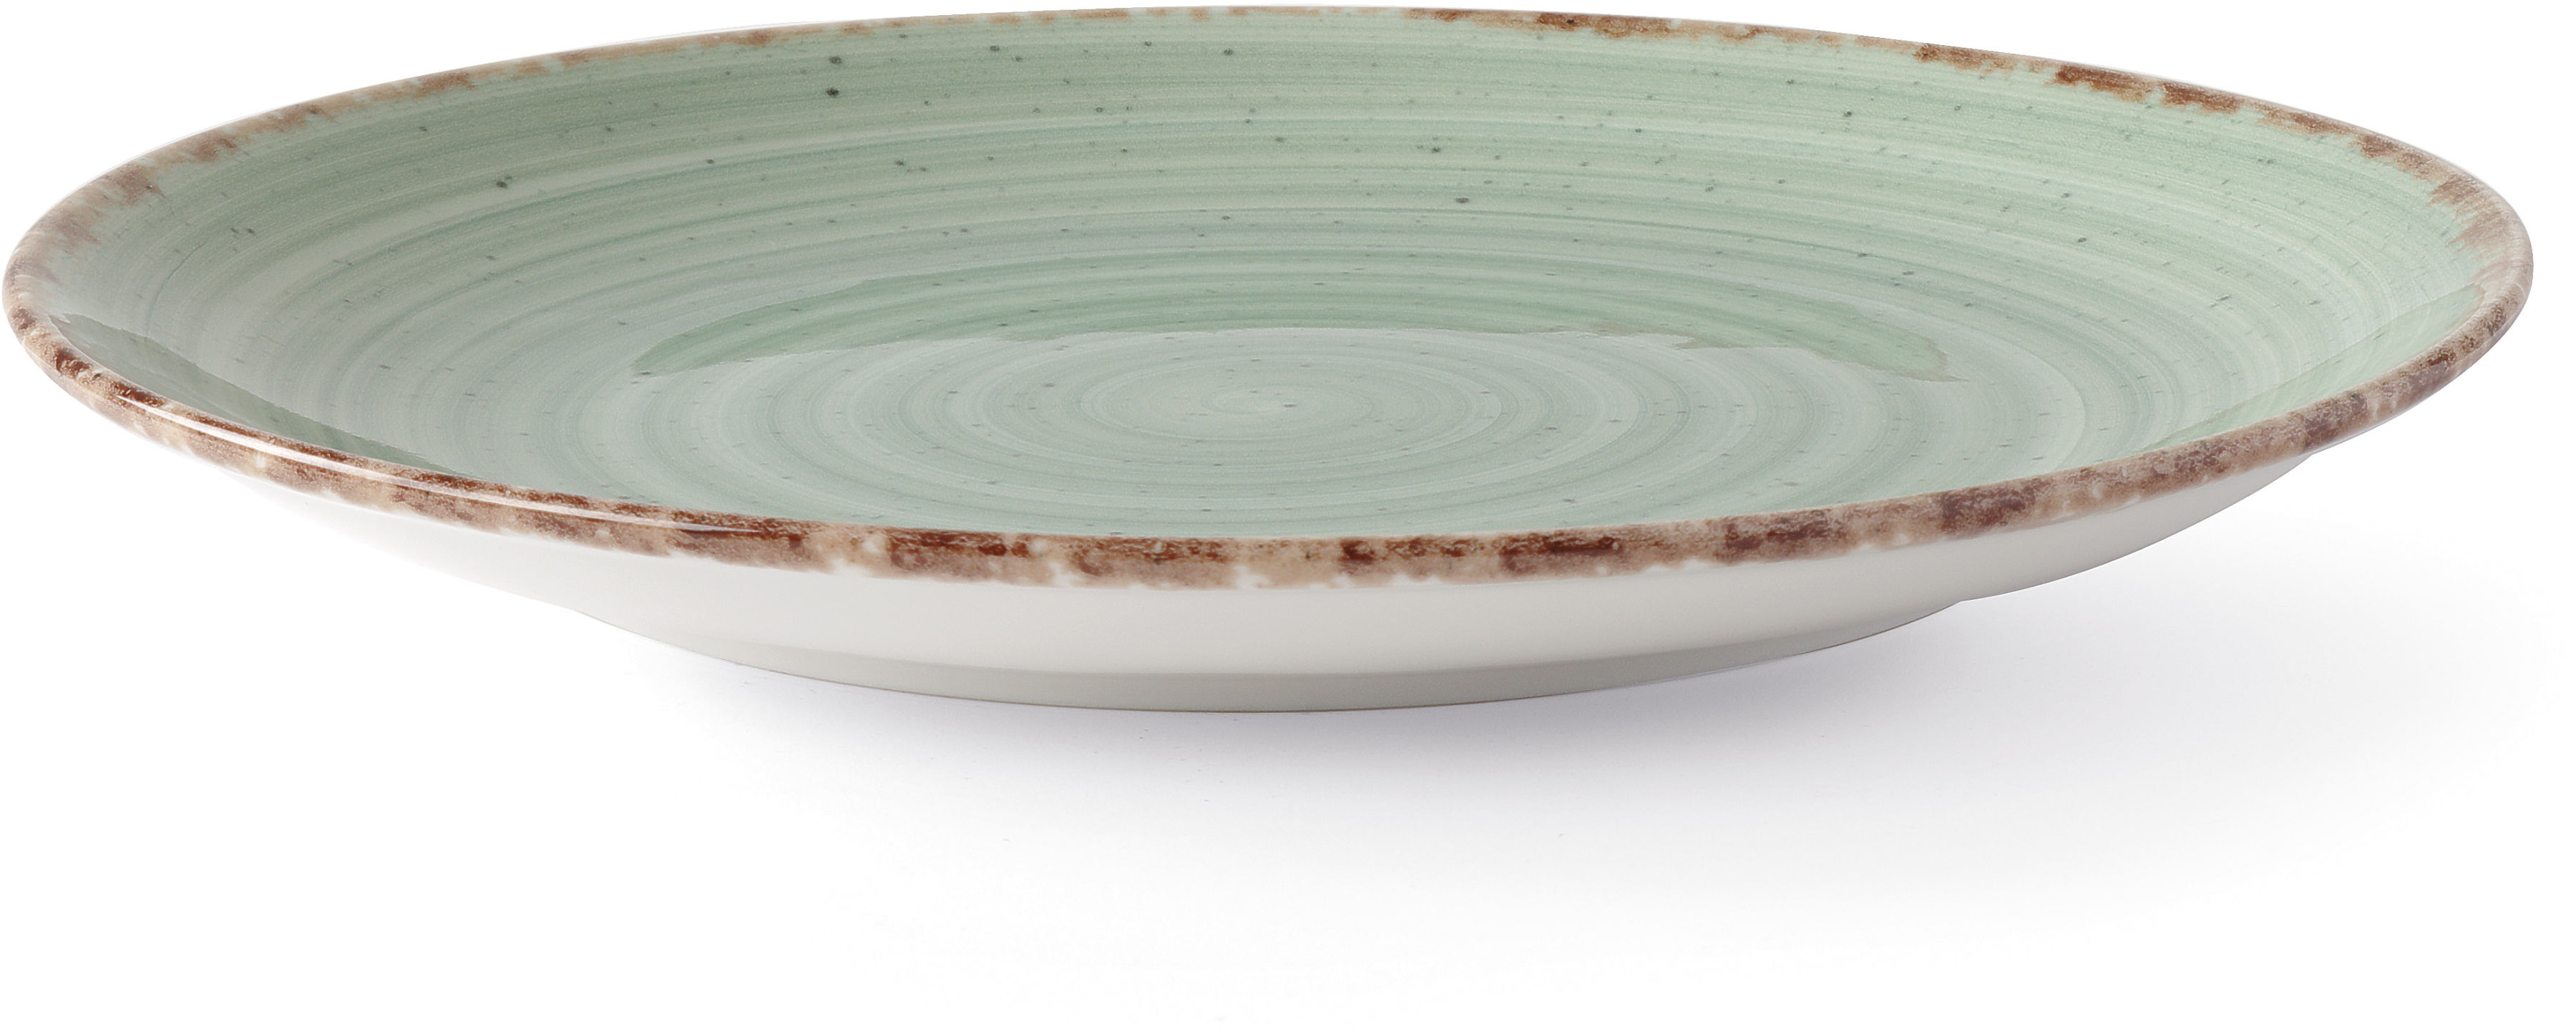 Talerz płytki Nefryt 270 mm porcelana Fine Dine 774526